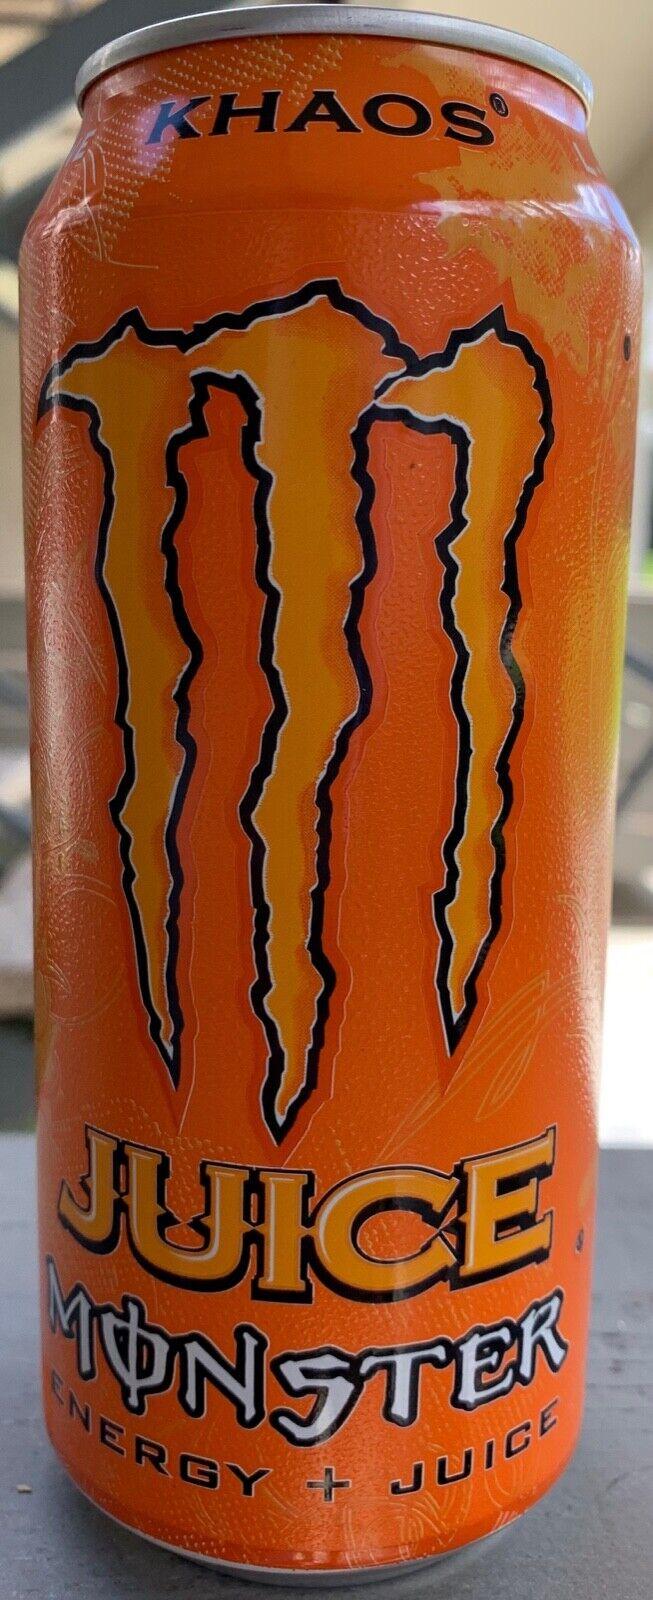 Энергетические напитки (Еда и напитки) NEW JUICE MONSTER KHAOS ENERGY DRINK 16 FL OZ FULL CAN FREE WORLD WIDE SHIPPING